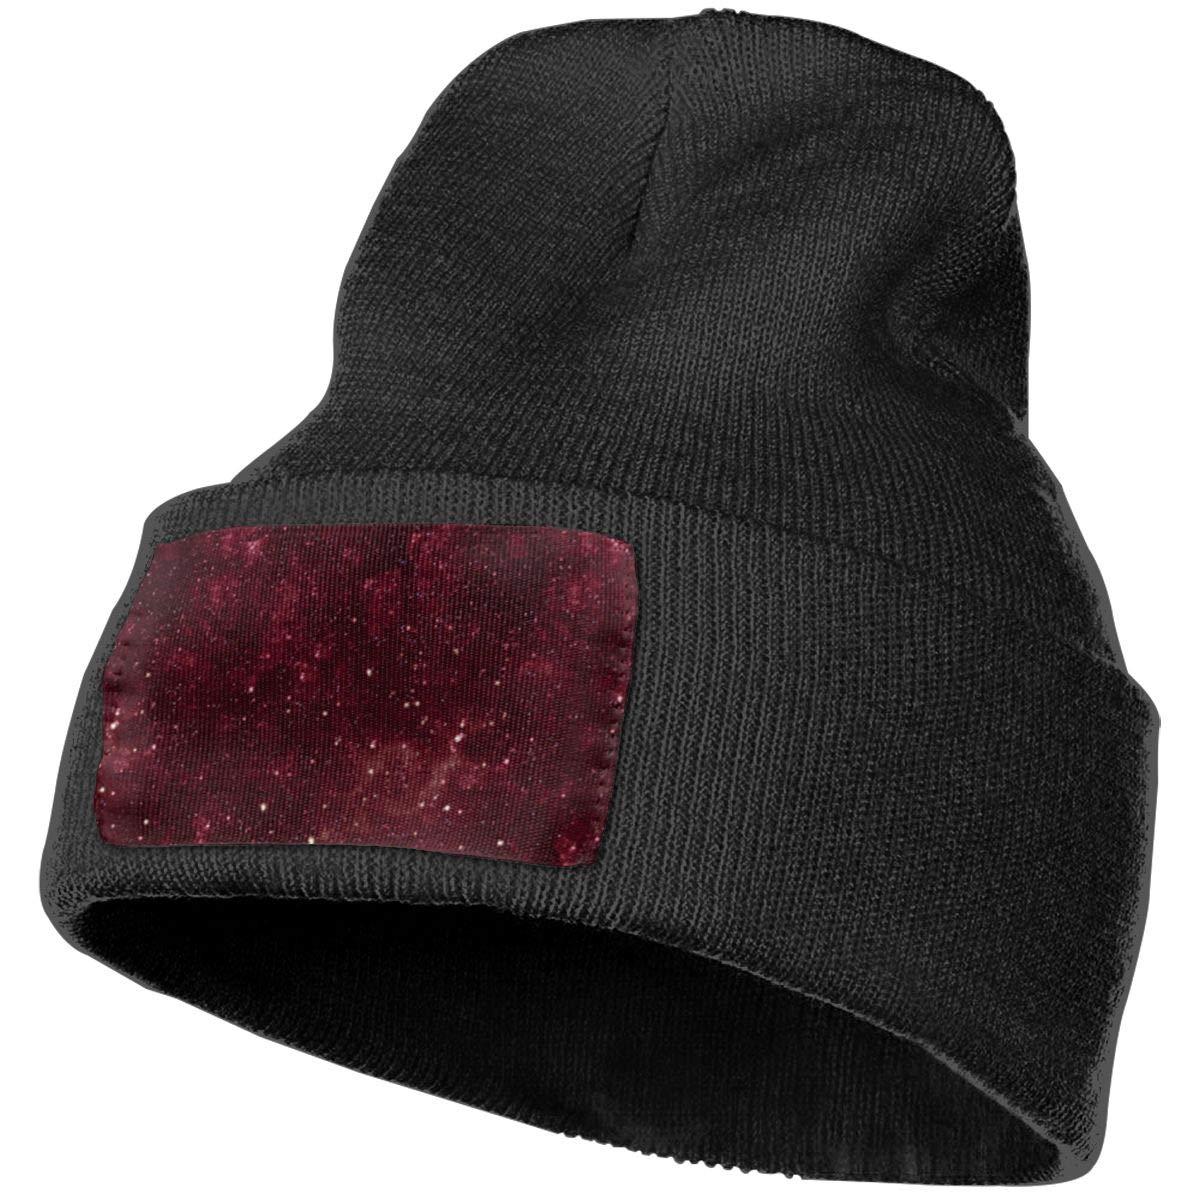 Ruin Planet Fashion Knitting Hat for Men Women 100/% Acrylic Acid Mas Beanie Hat